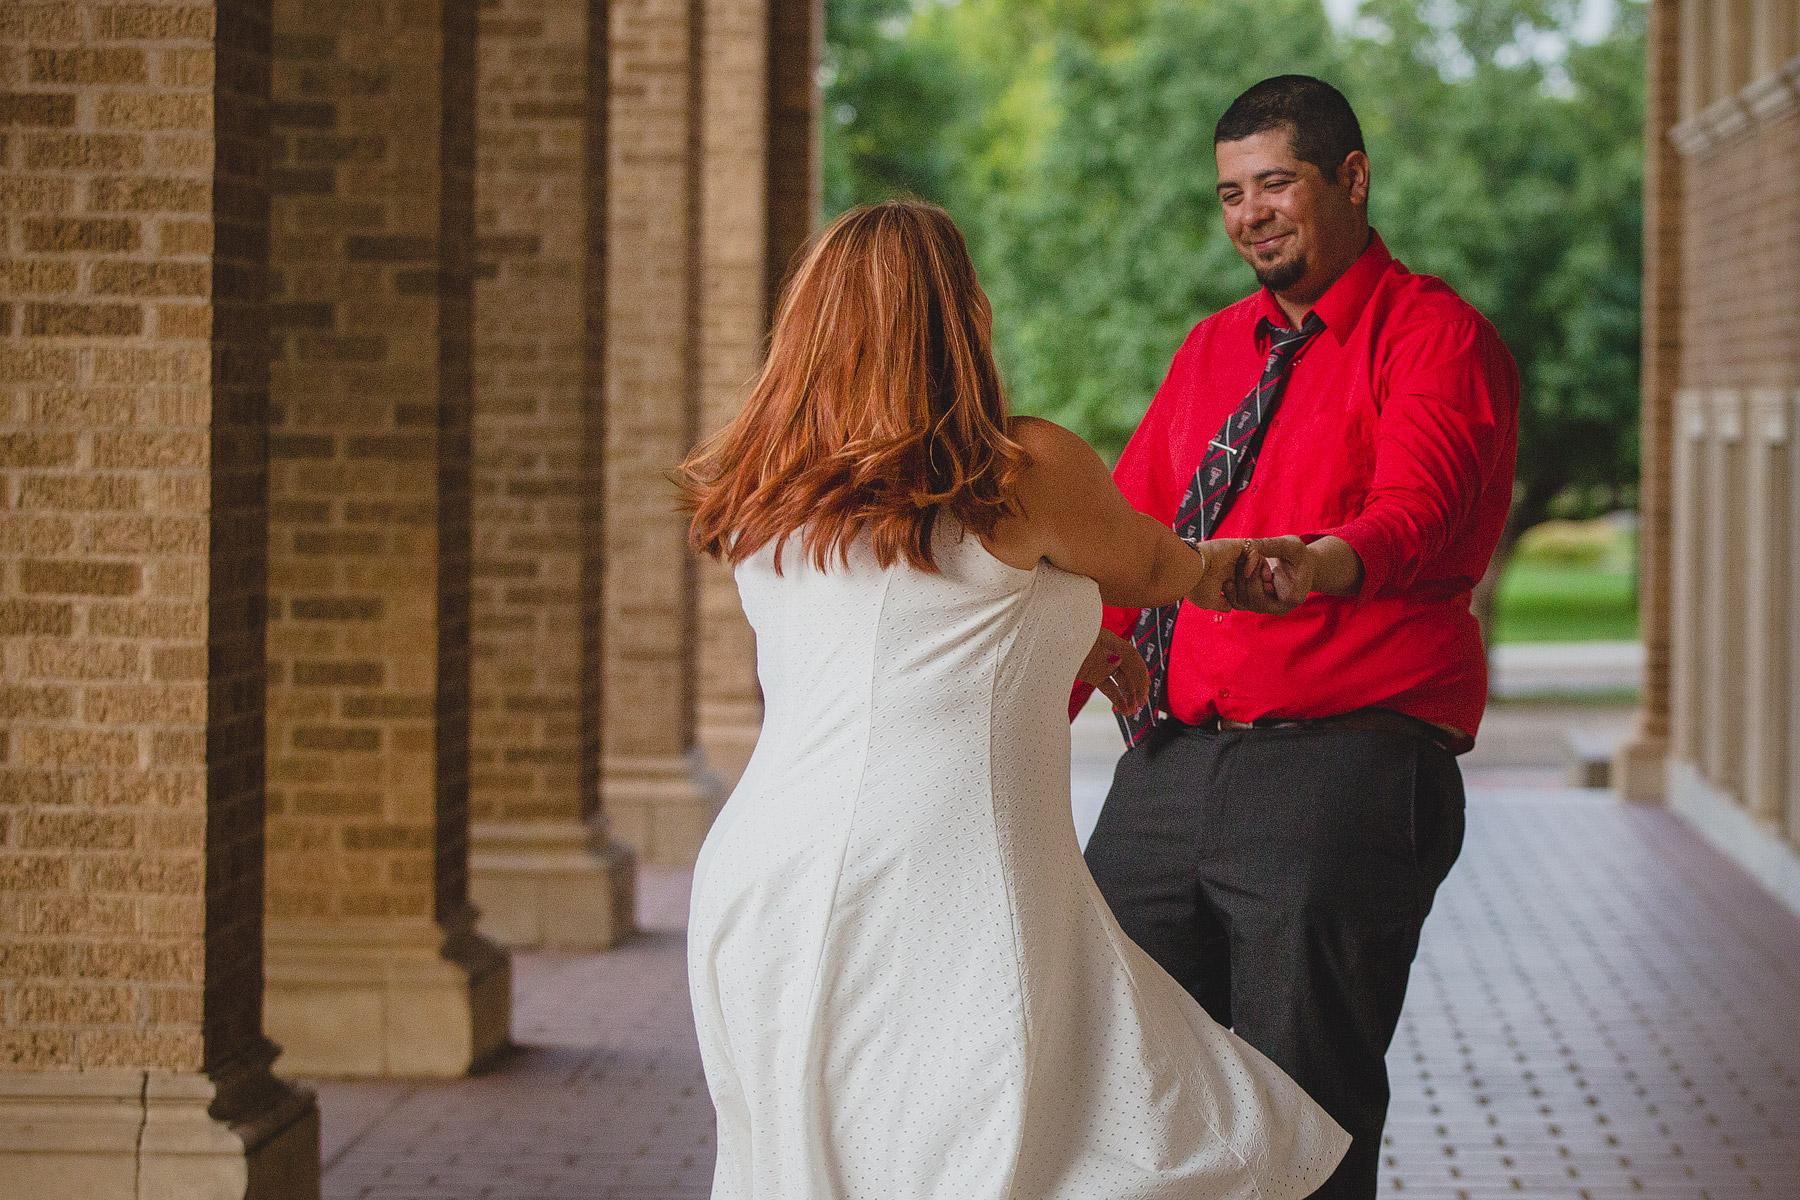 kristin_bednarz_documentary_wedding_photographer_20190615_00454_Hobson_Sharp.jpg